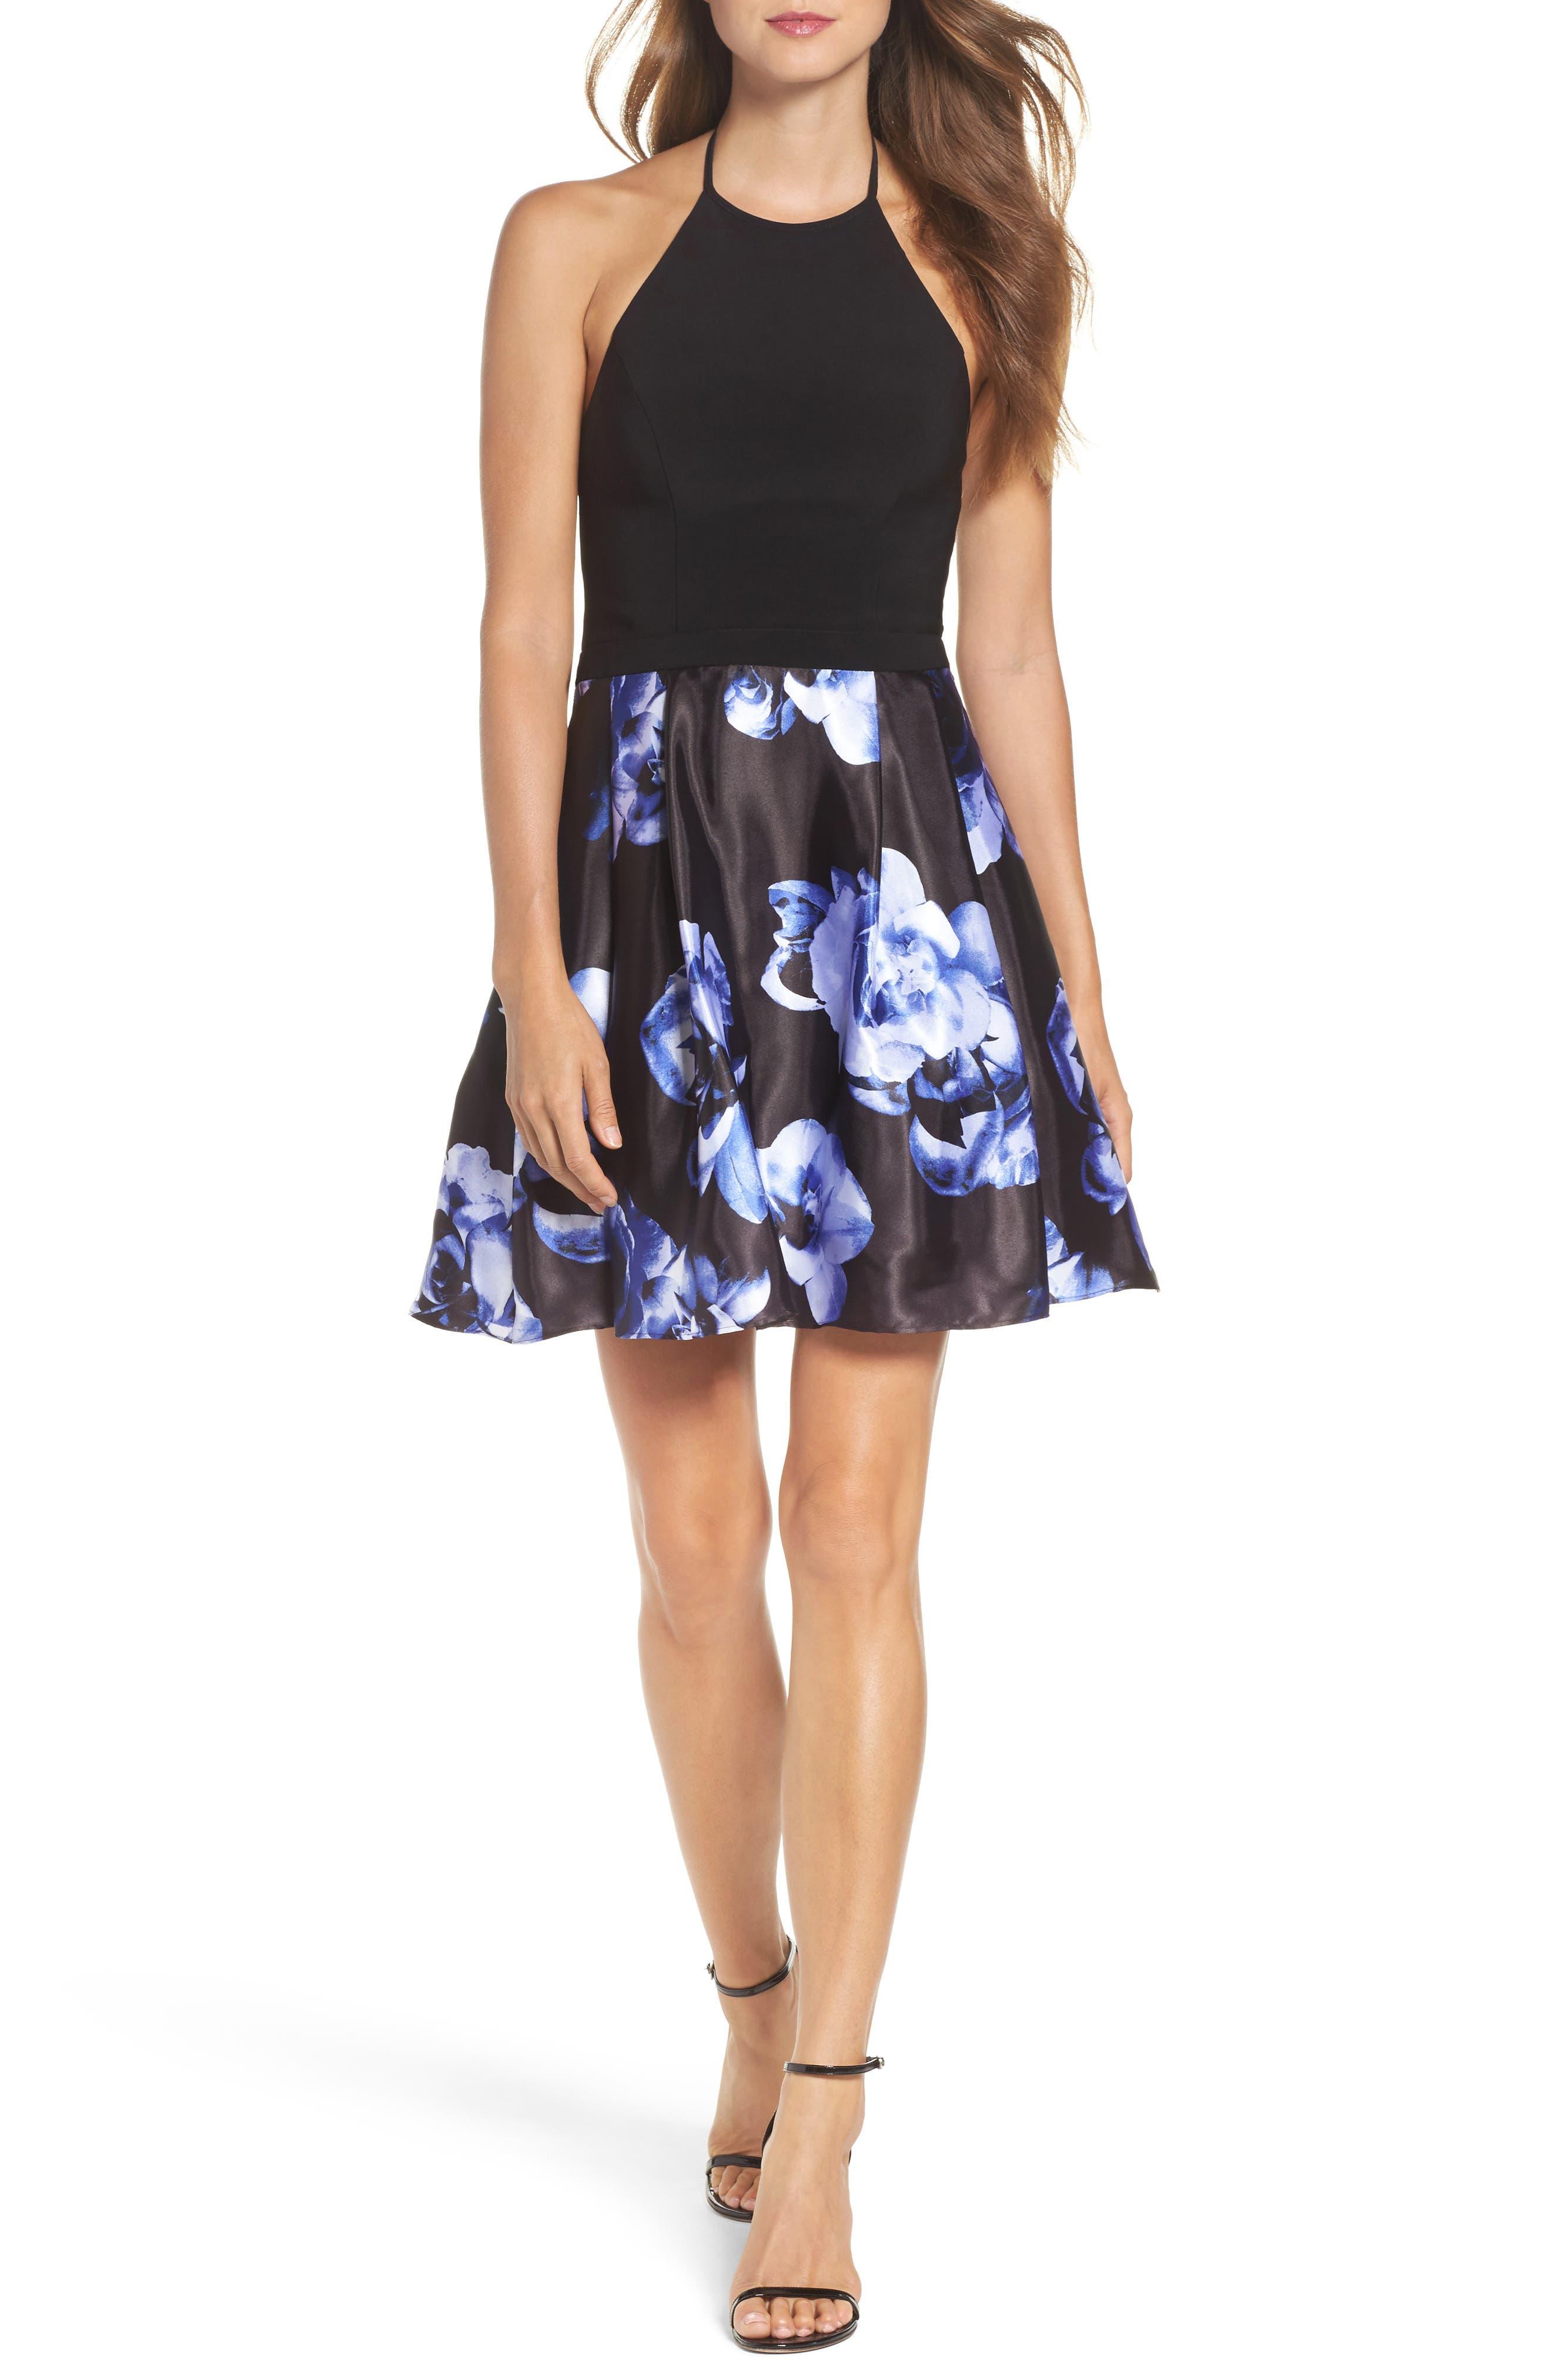 Main Image - Blondie Nites Floral Skirt Halter Skater Dress